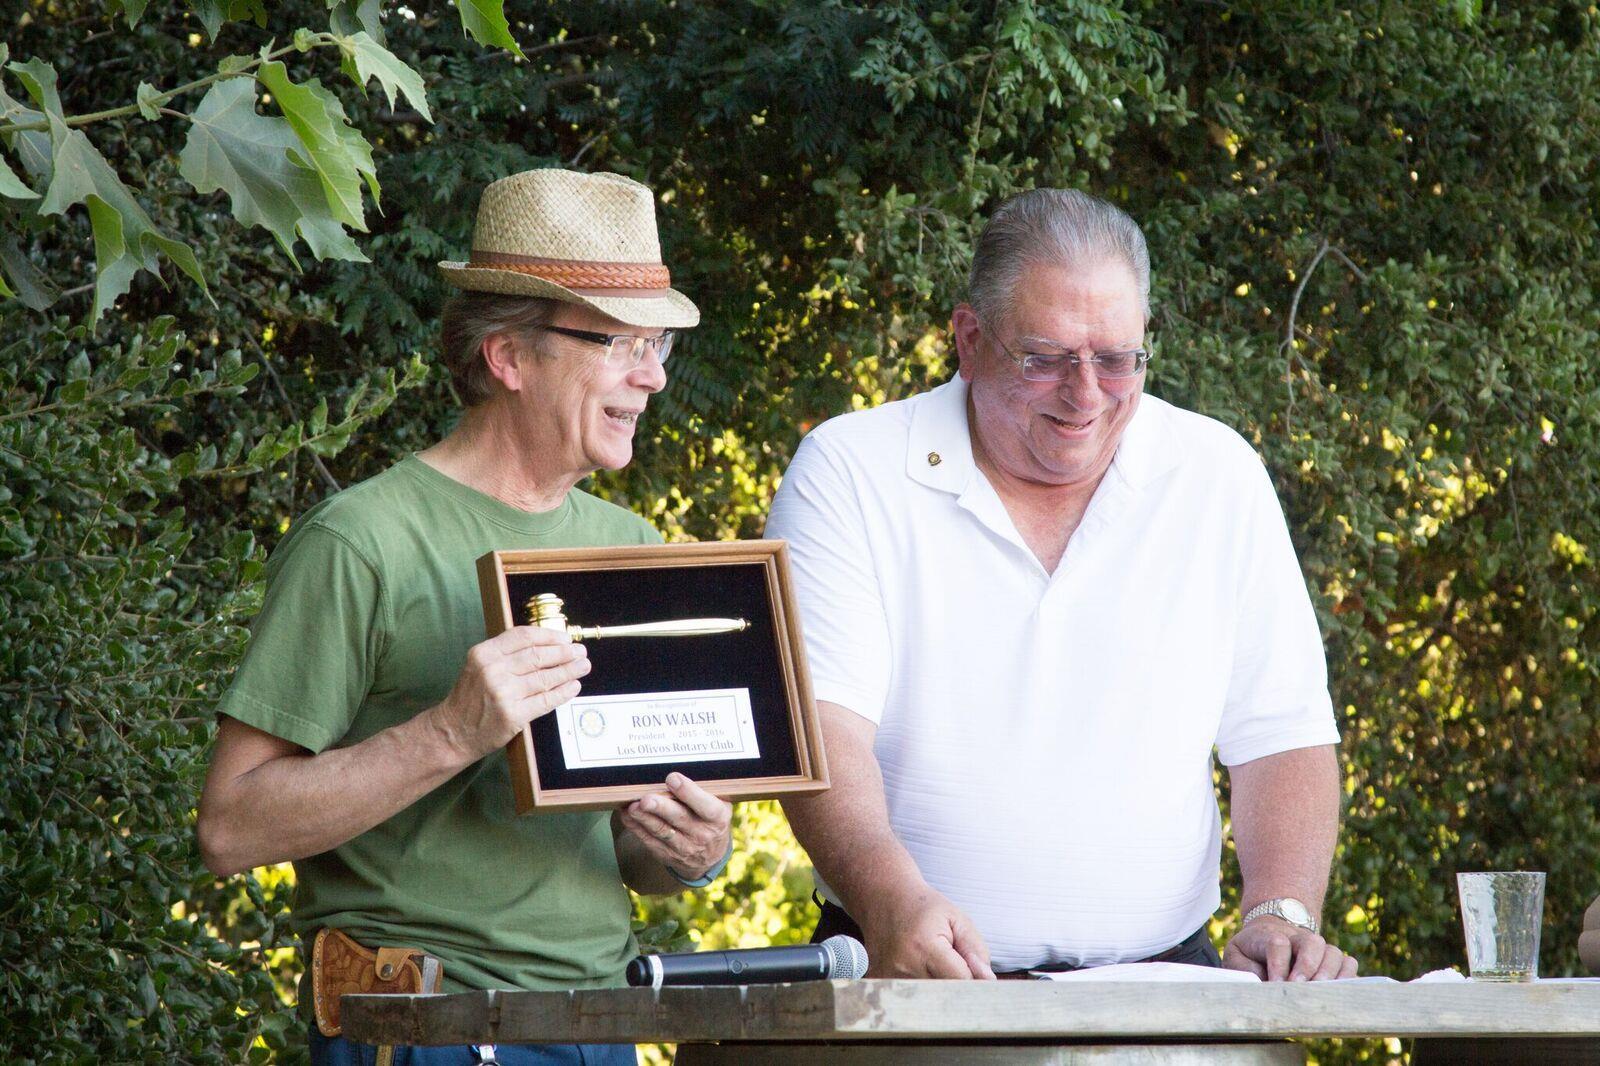 PHOTO - Steve makes presentation to Ron